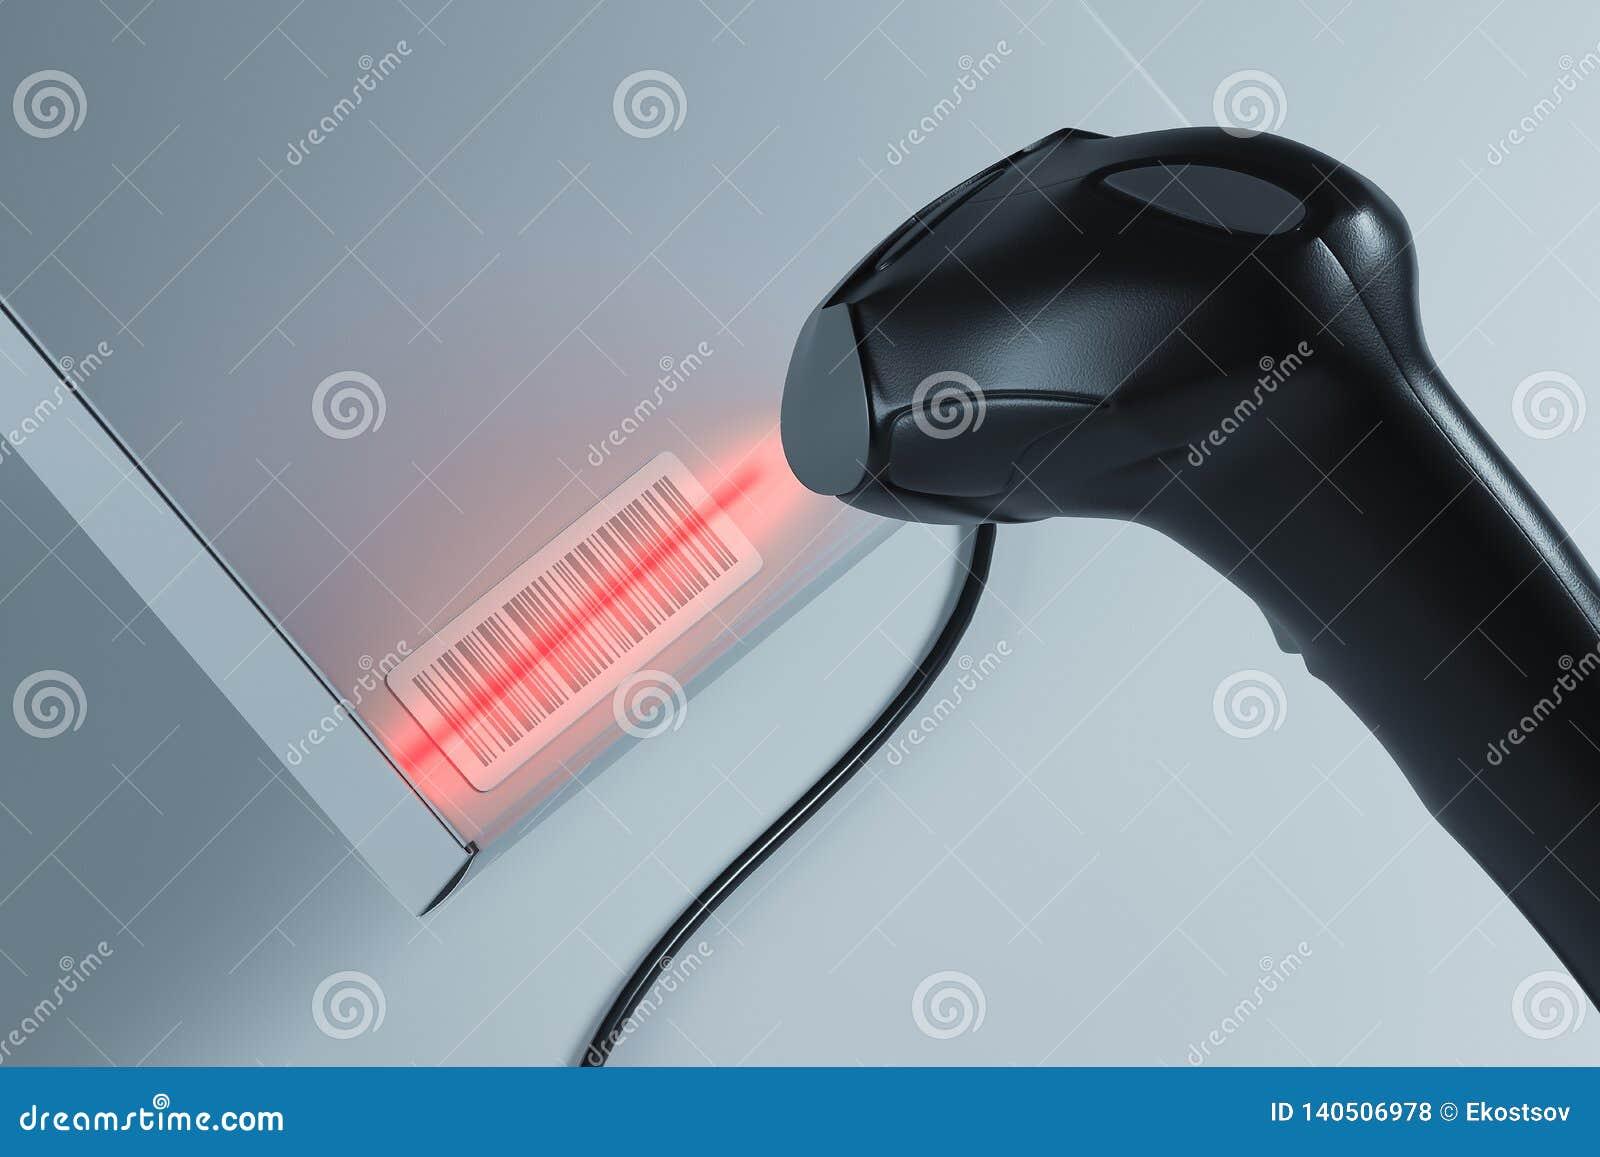 Modern Stylish Barcode Scanner Scanning Bar Code With Laser